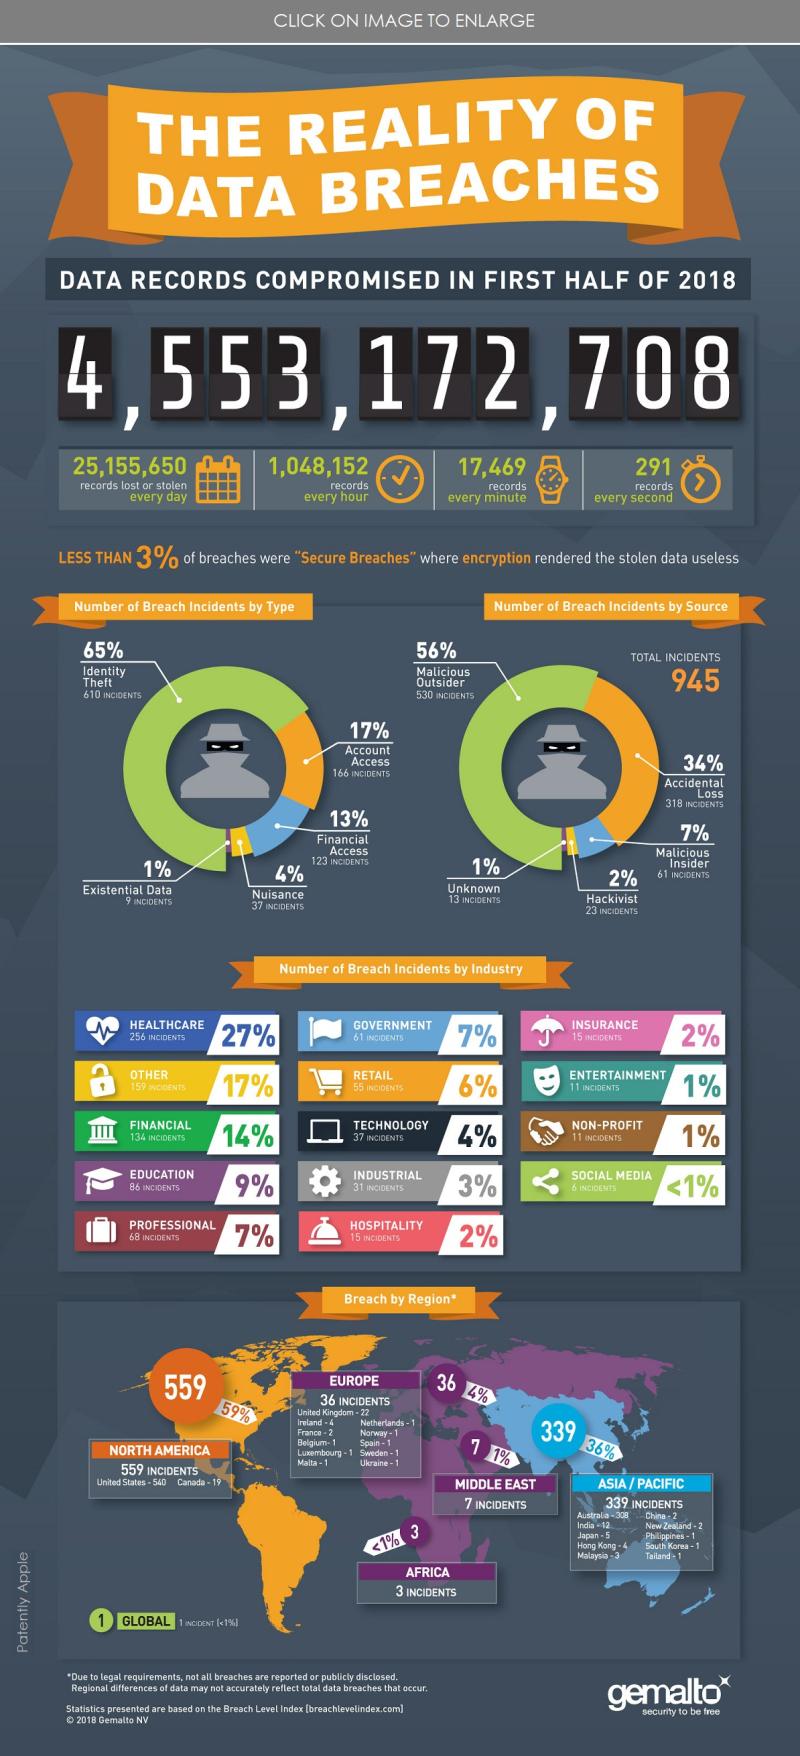 2 Gemmalto Infographic